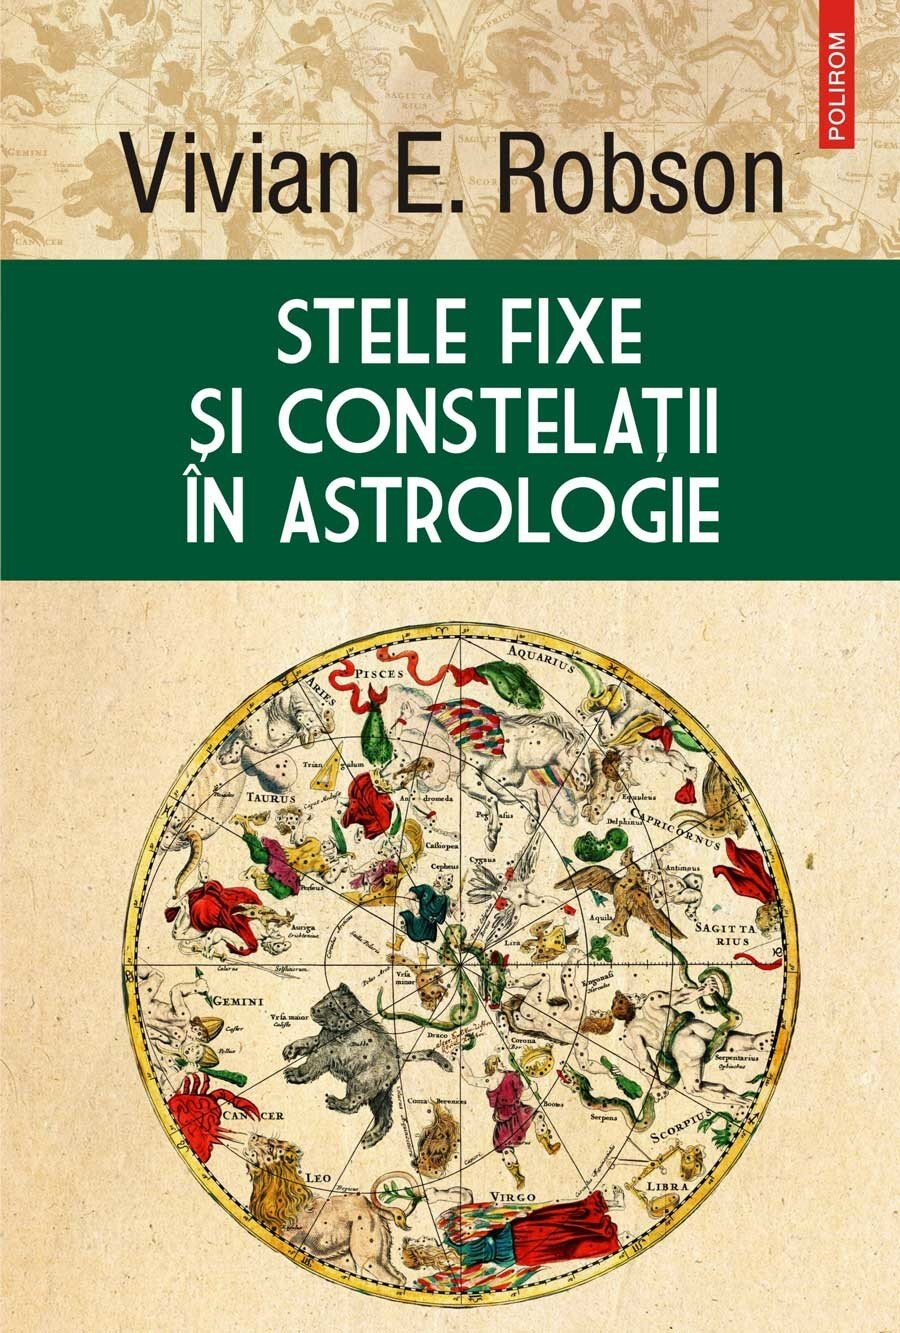 Stele fixe si constelatii in astrologie (eBook)